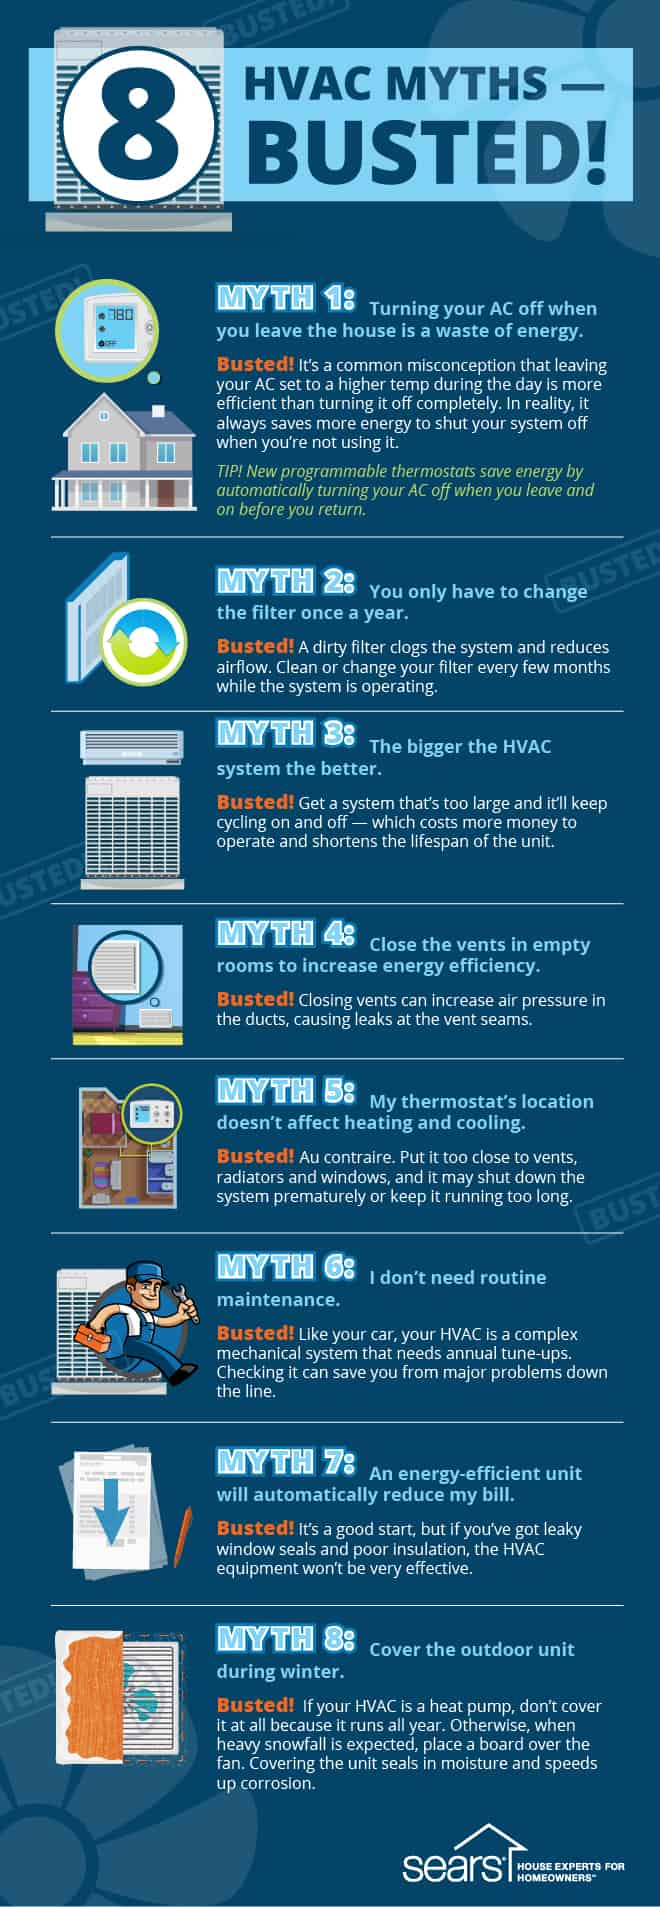 5 Home HVAC Maintenance Tips with 8 hvac myths busted